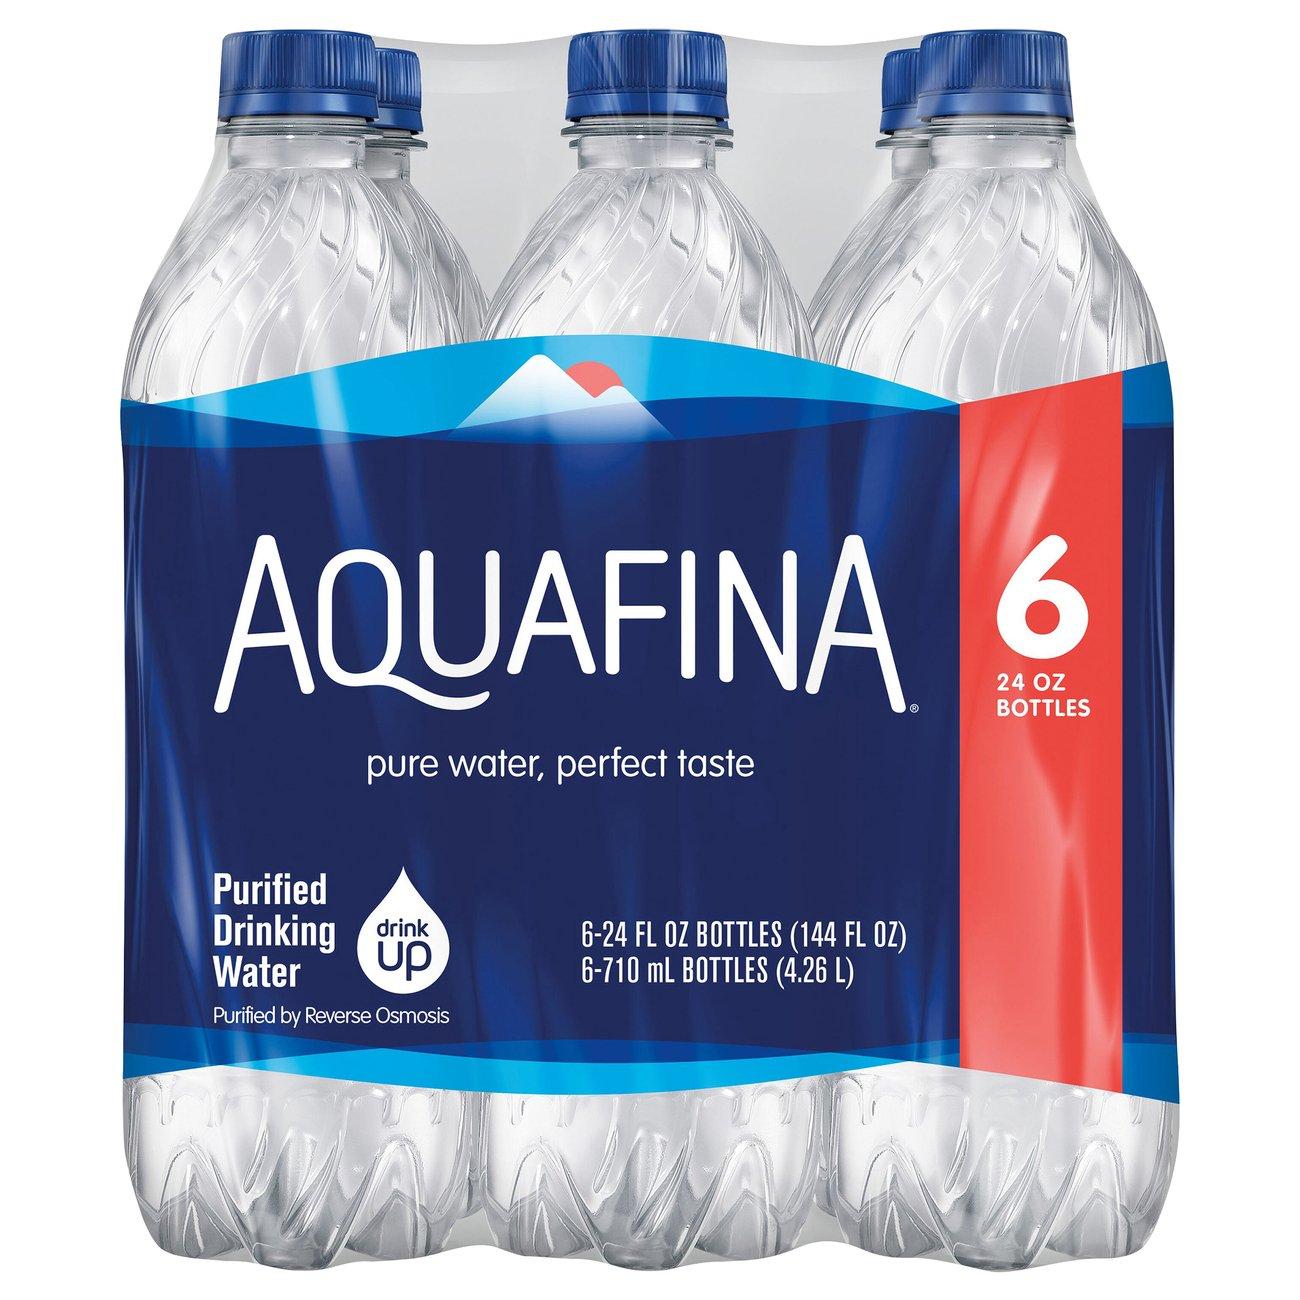 Aquafina Purified Drinking Water 24 oz